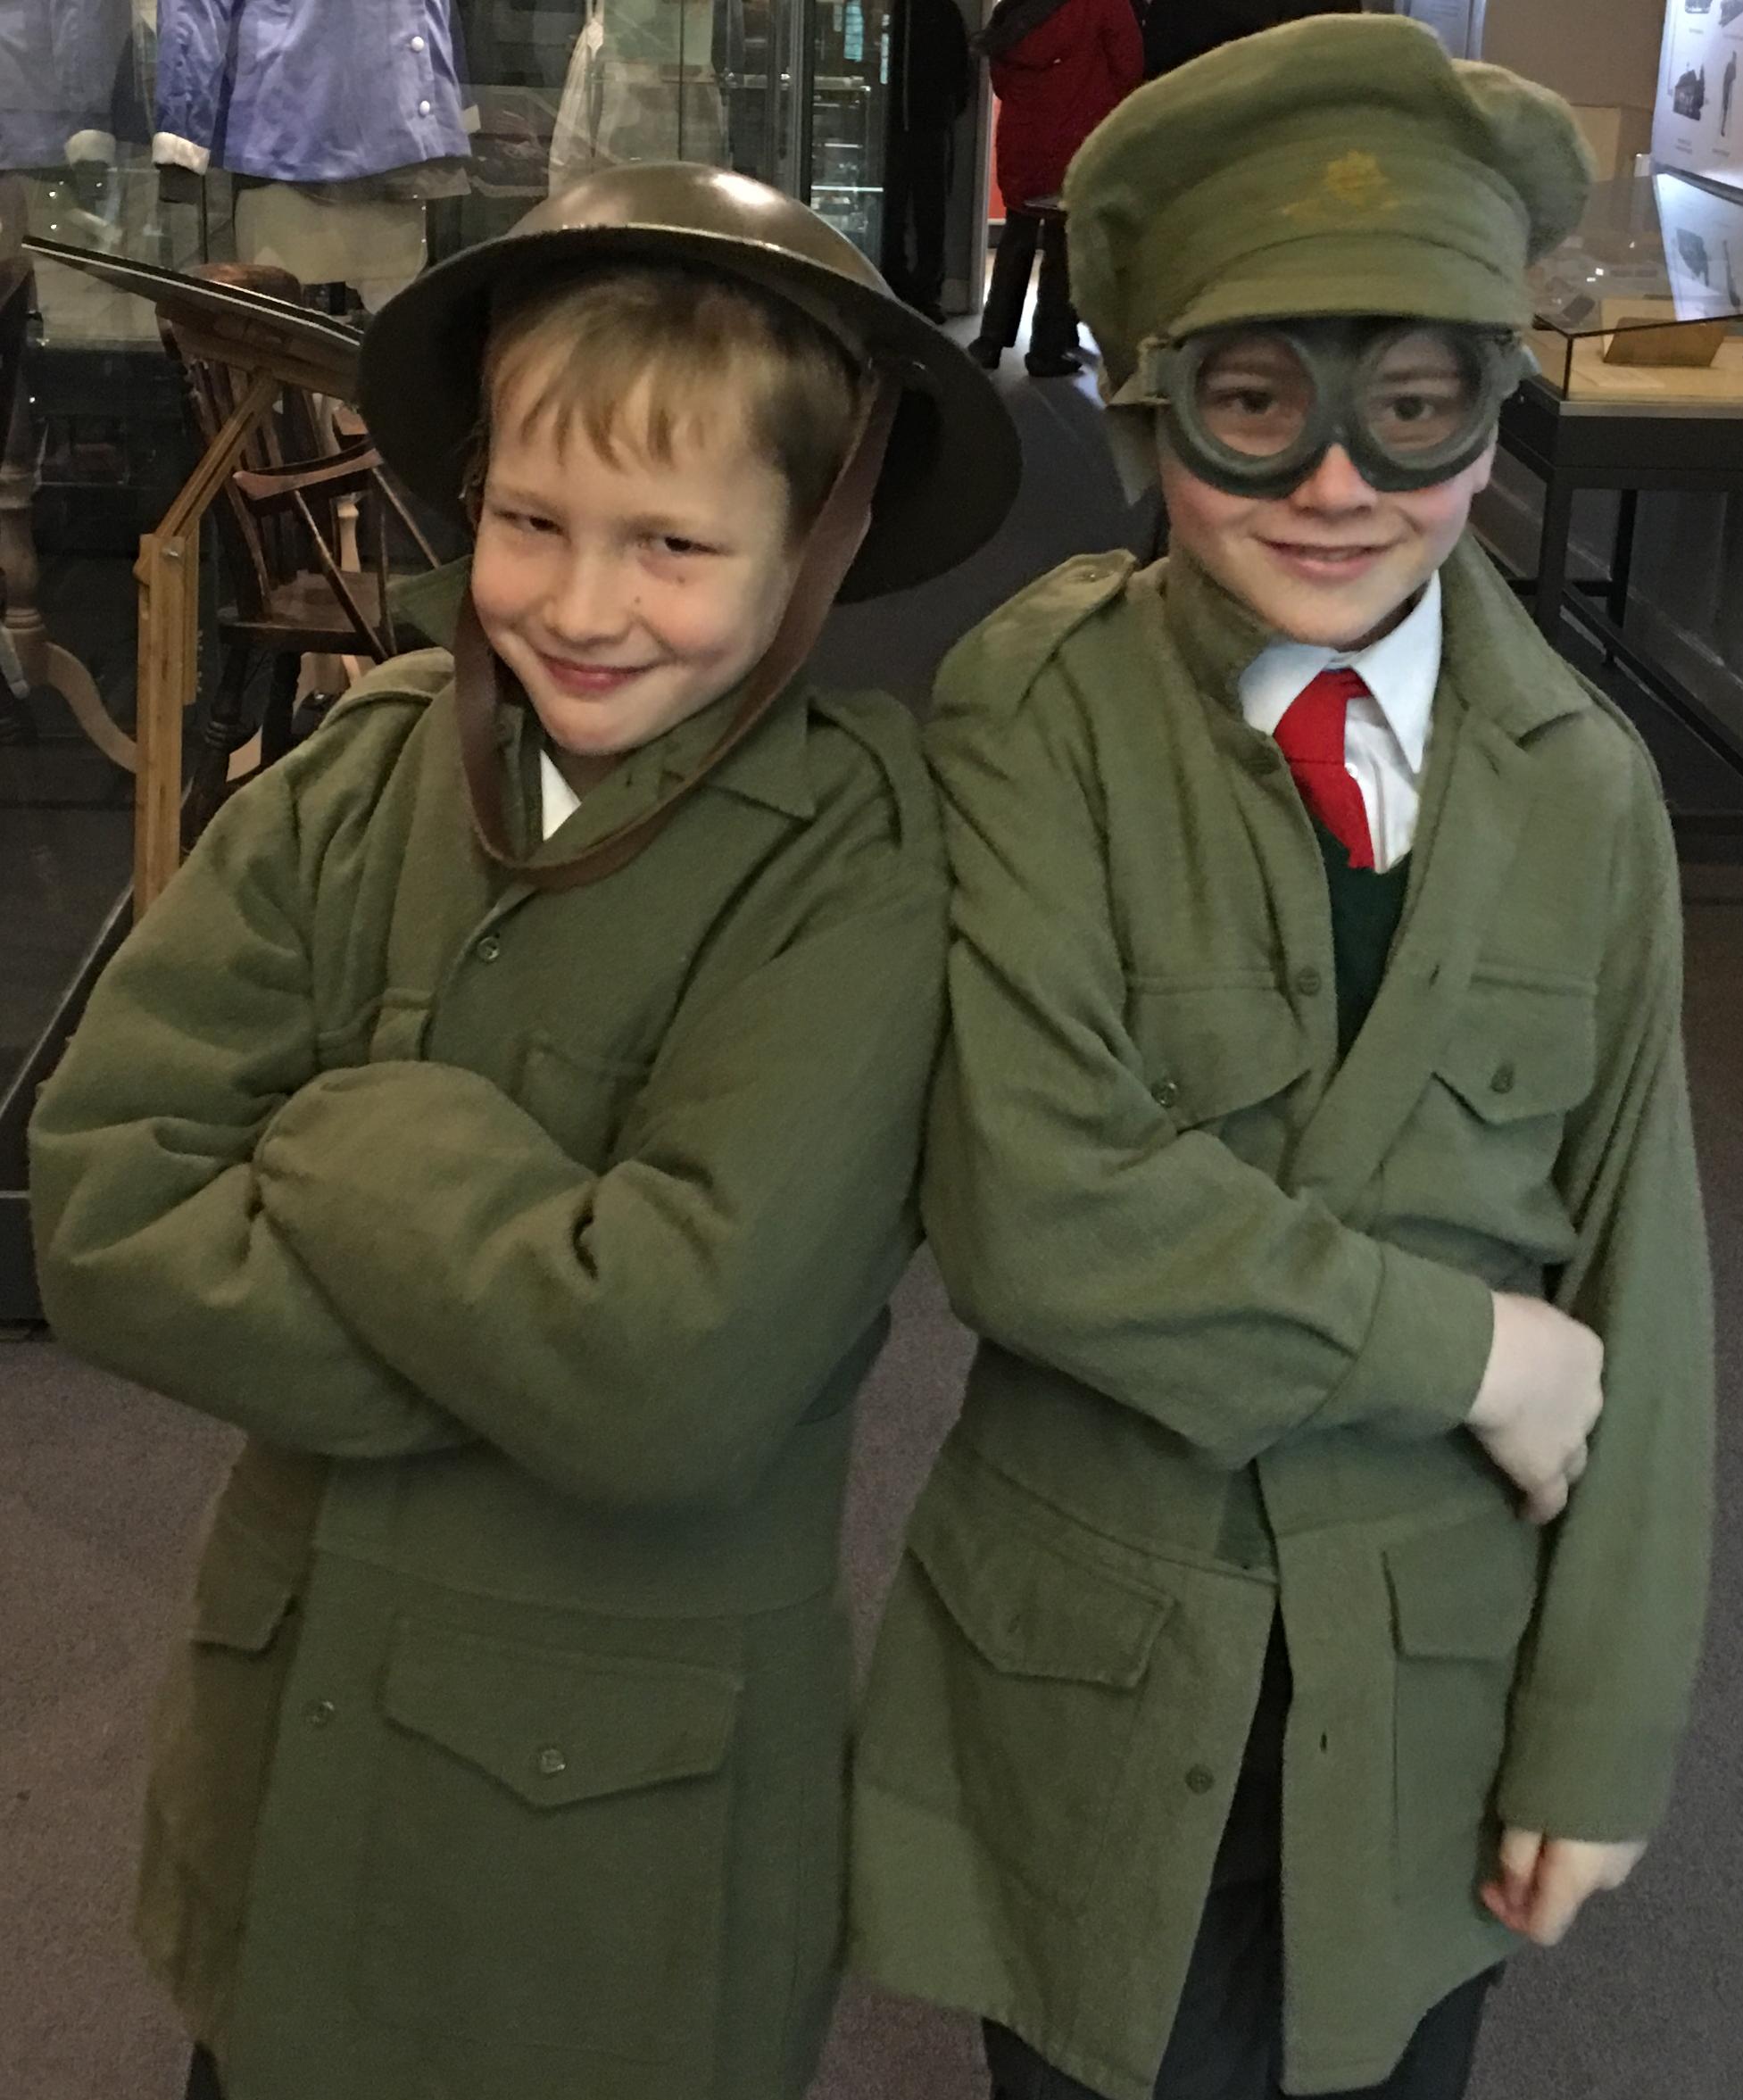 Two boys in FWW Soldier